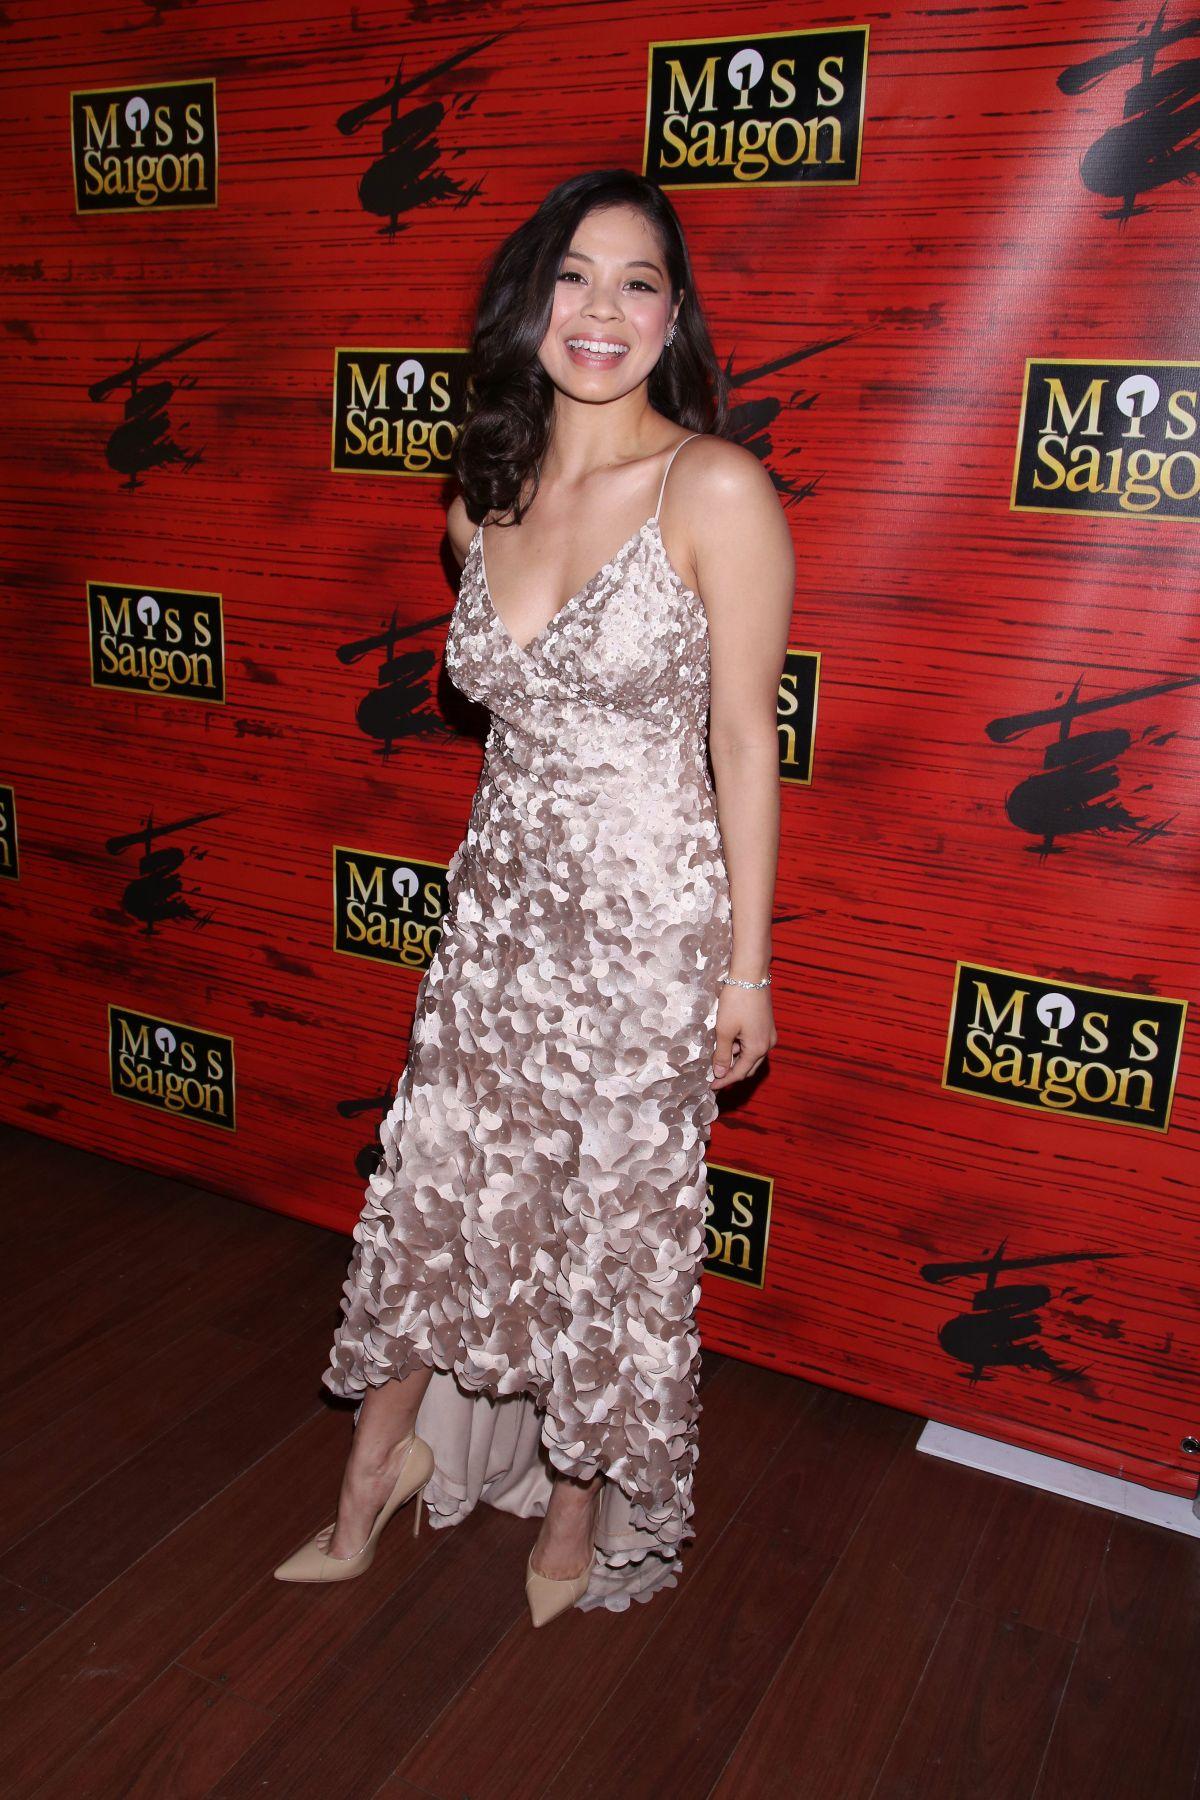 EVA NOBLEZADA at Miss Saigon Broadway Opening Night Party in New York 03/23/2017